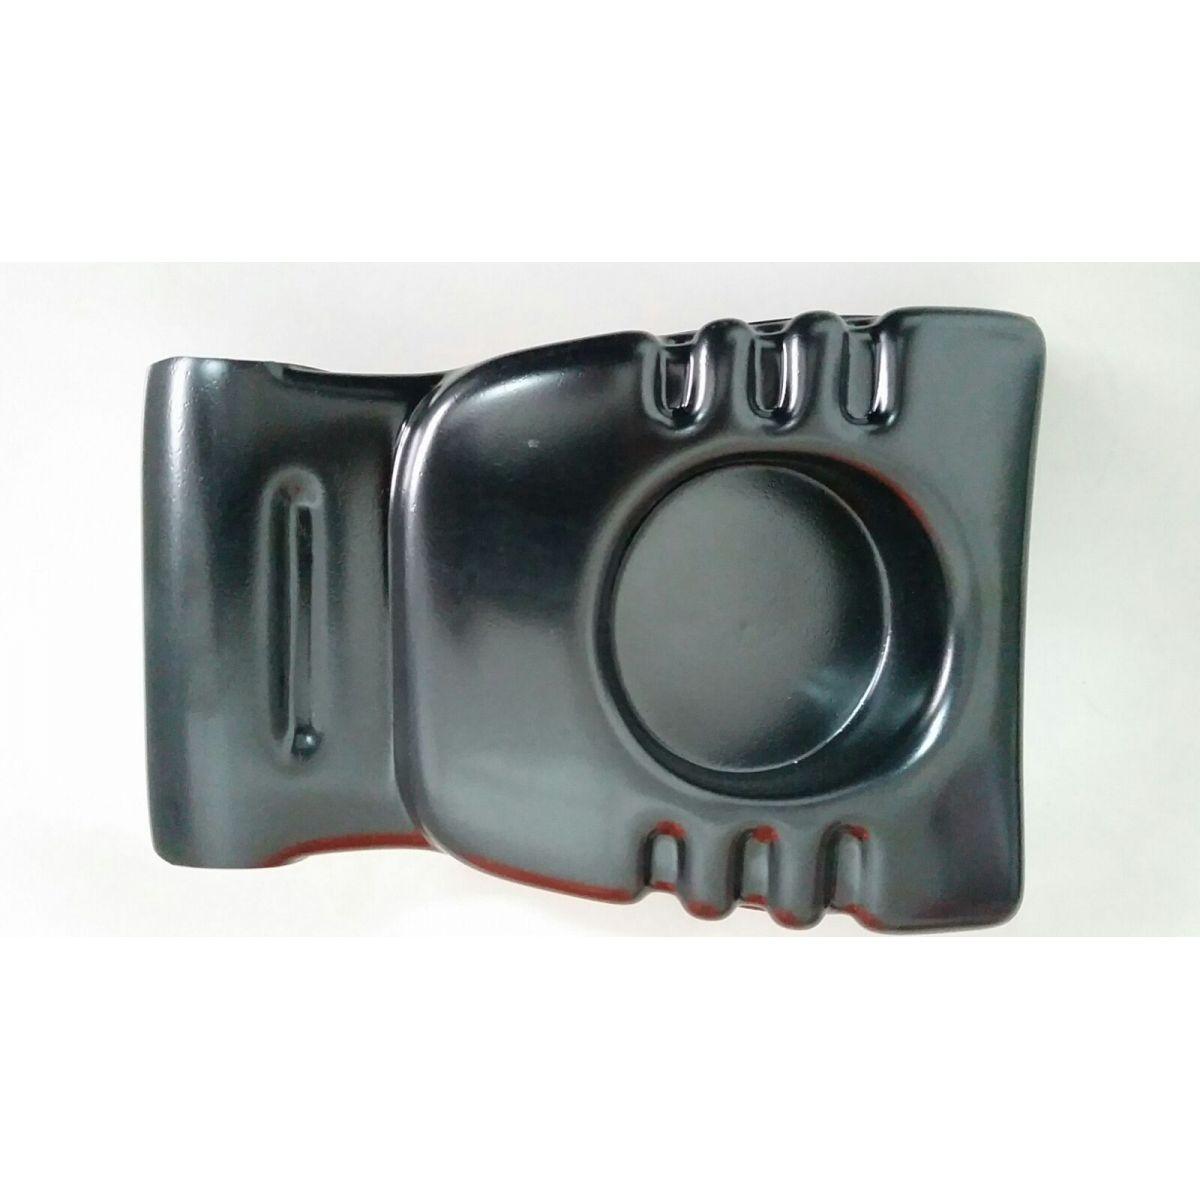 Porta Garrafinha Squeeze Esteira Movement LX 160 G1